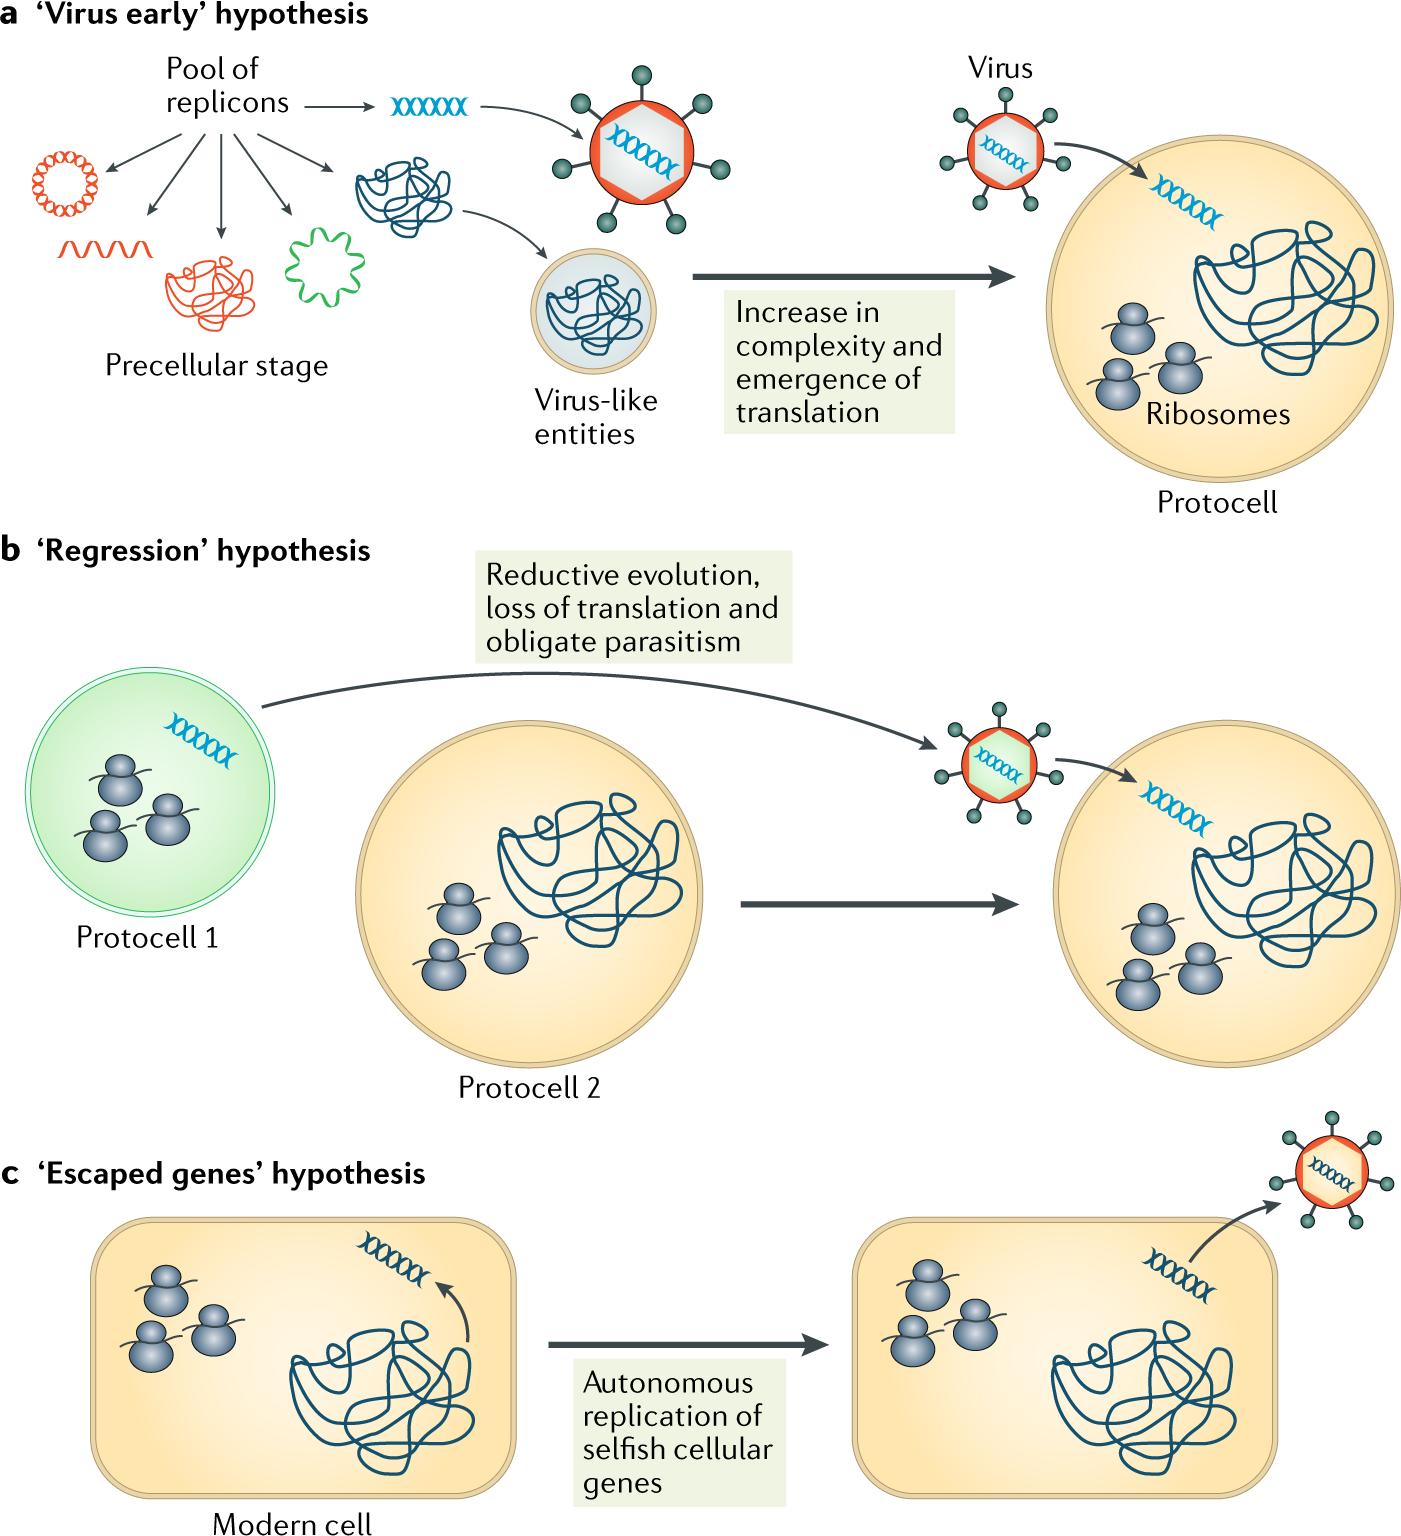 Origin of viruses: primordial replicators recruiting capsids from host